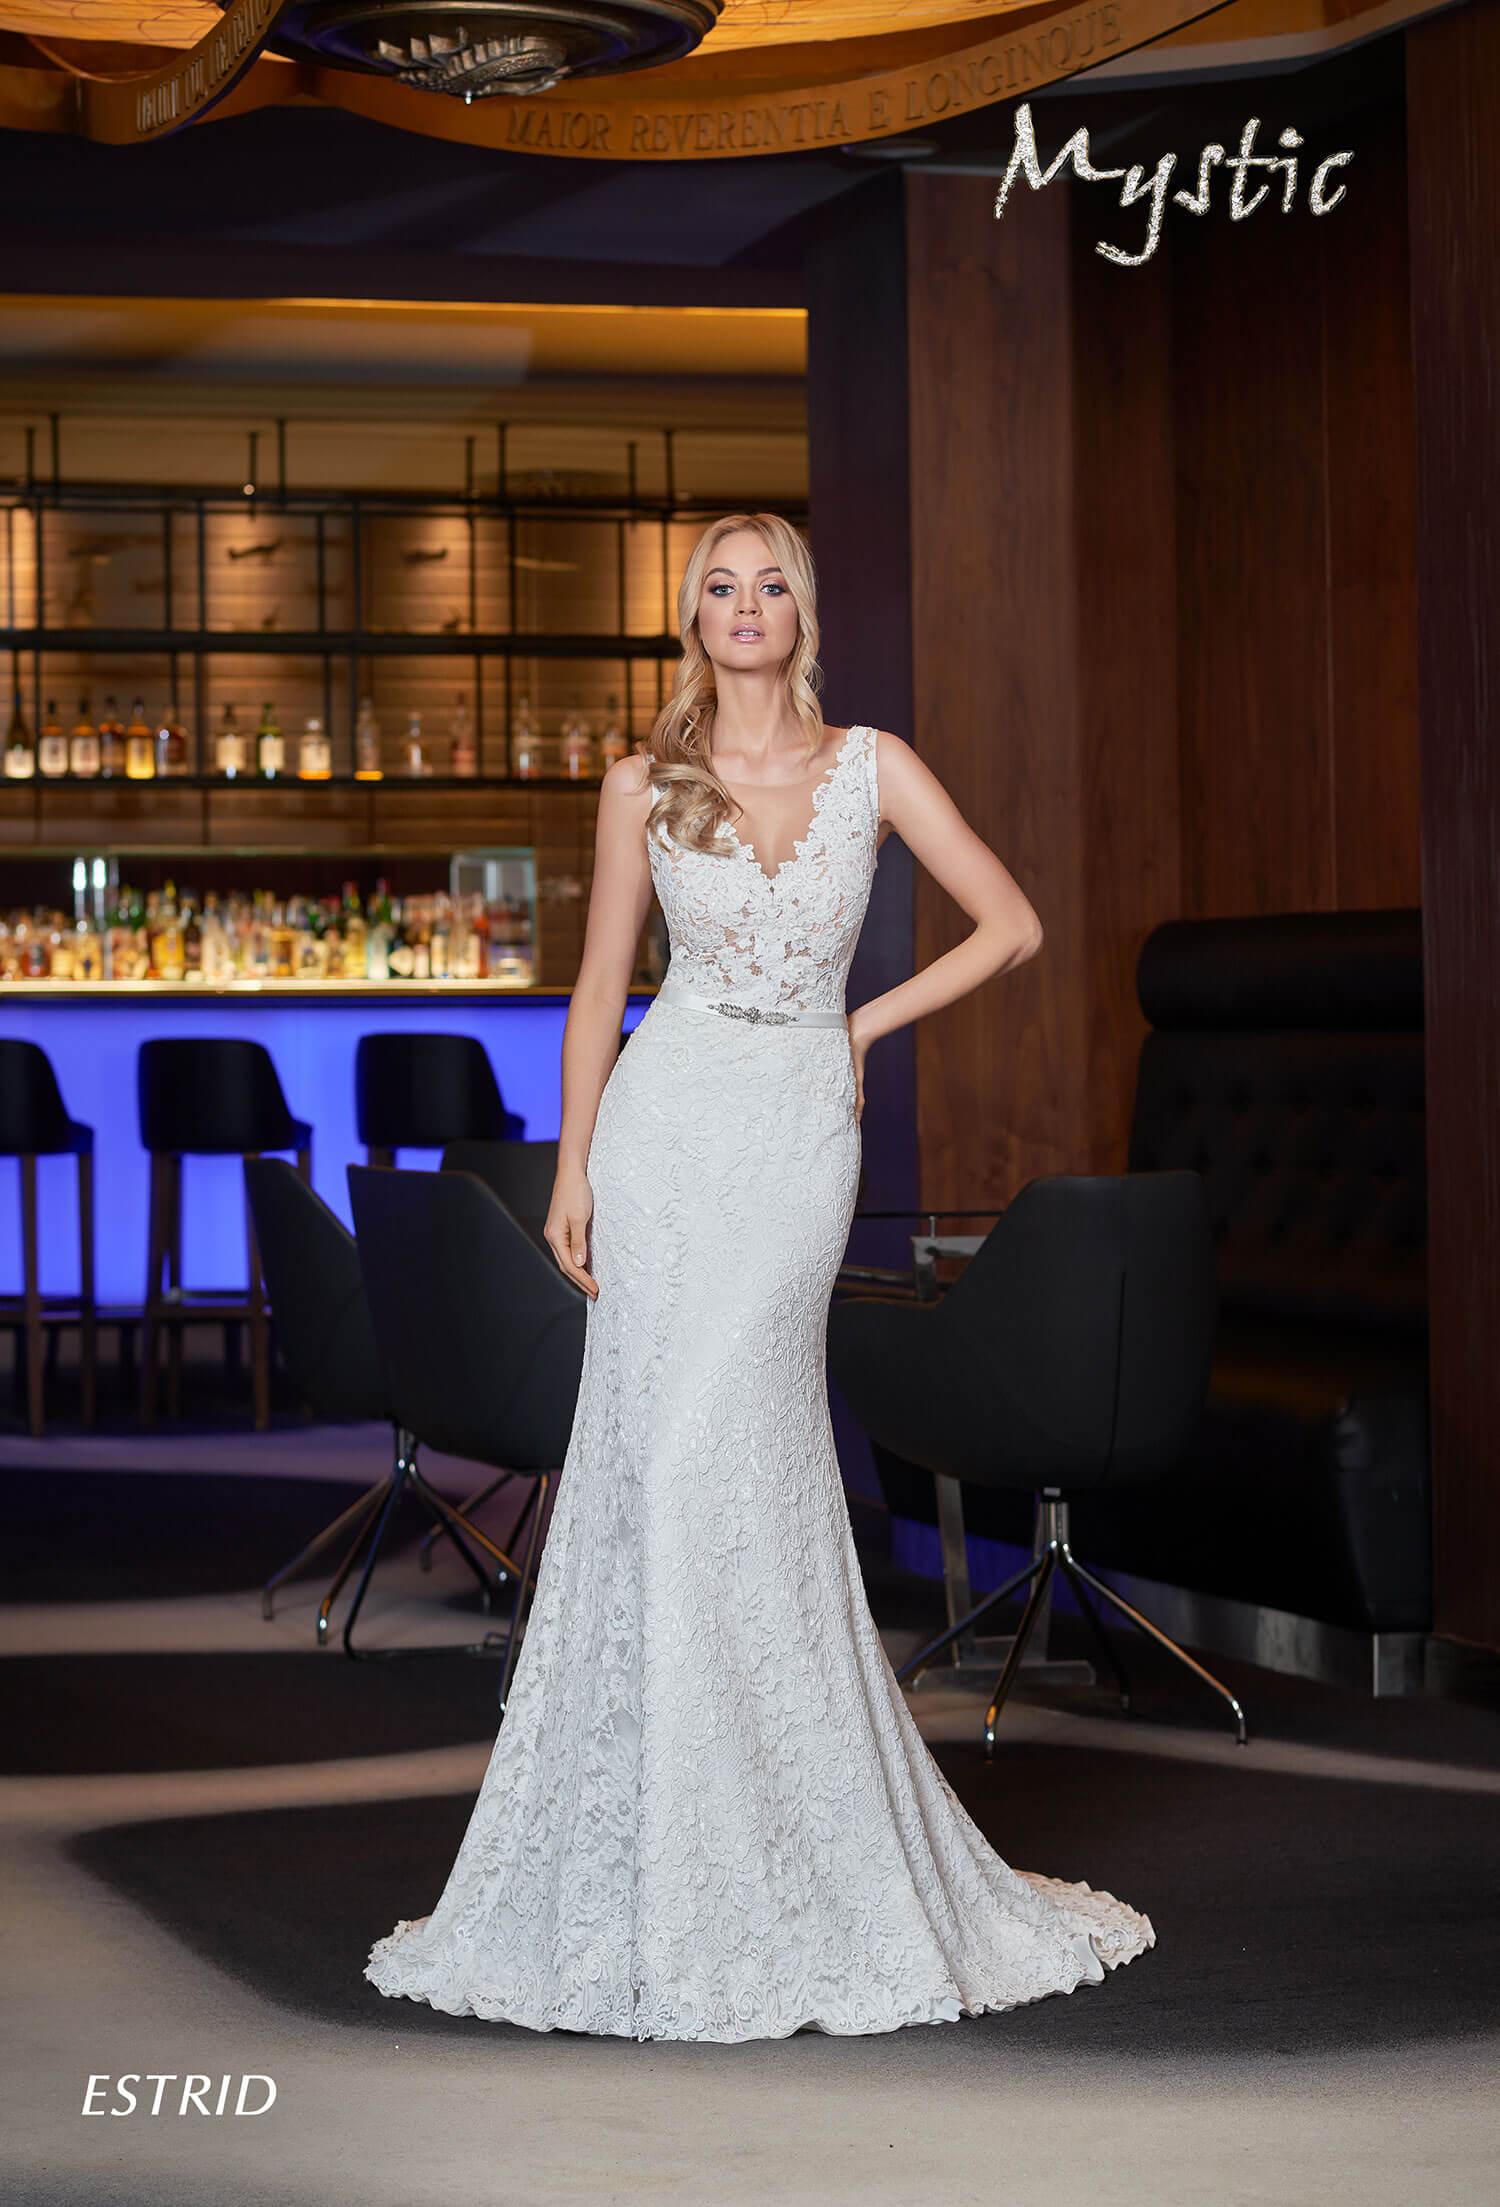 e2b5a7adff Mystic Bridal - producent i projektant sukien ślubnych